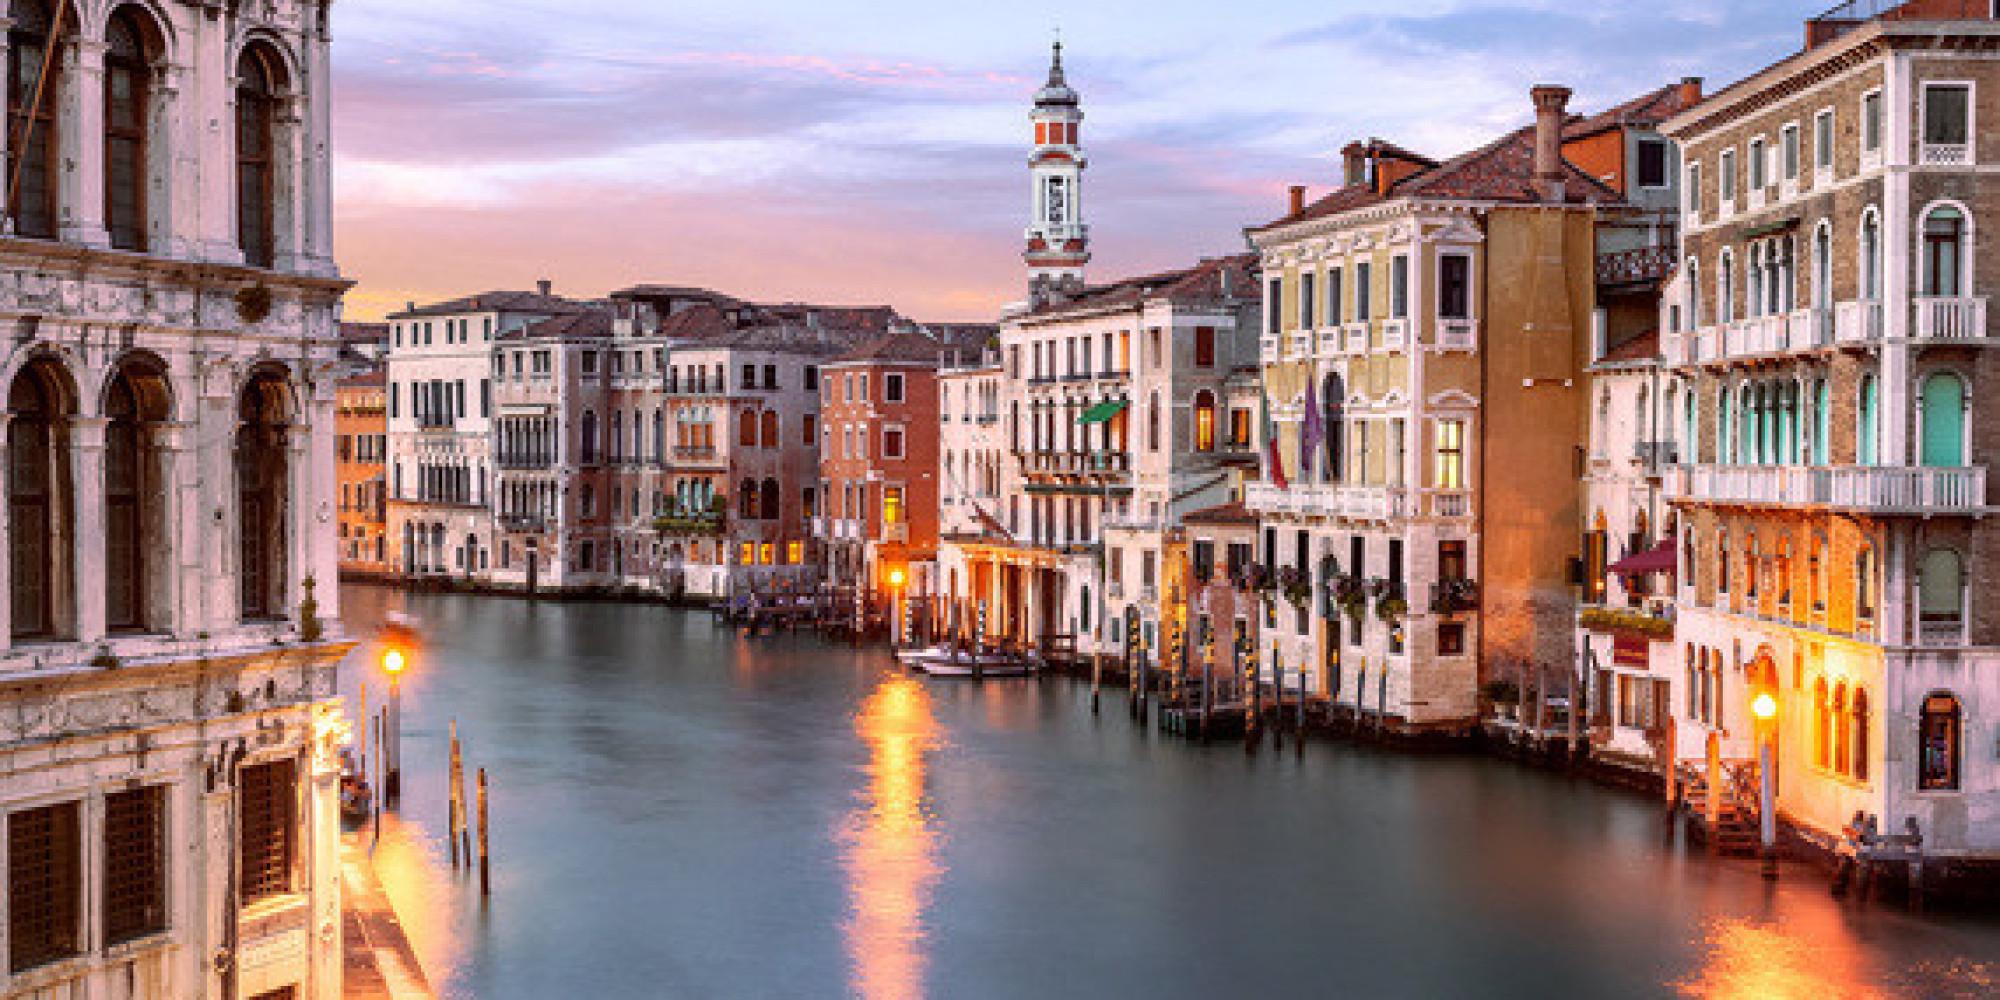 Cheap Flights from Paris to Venice